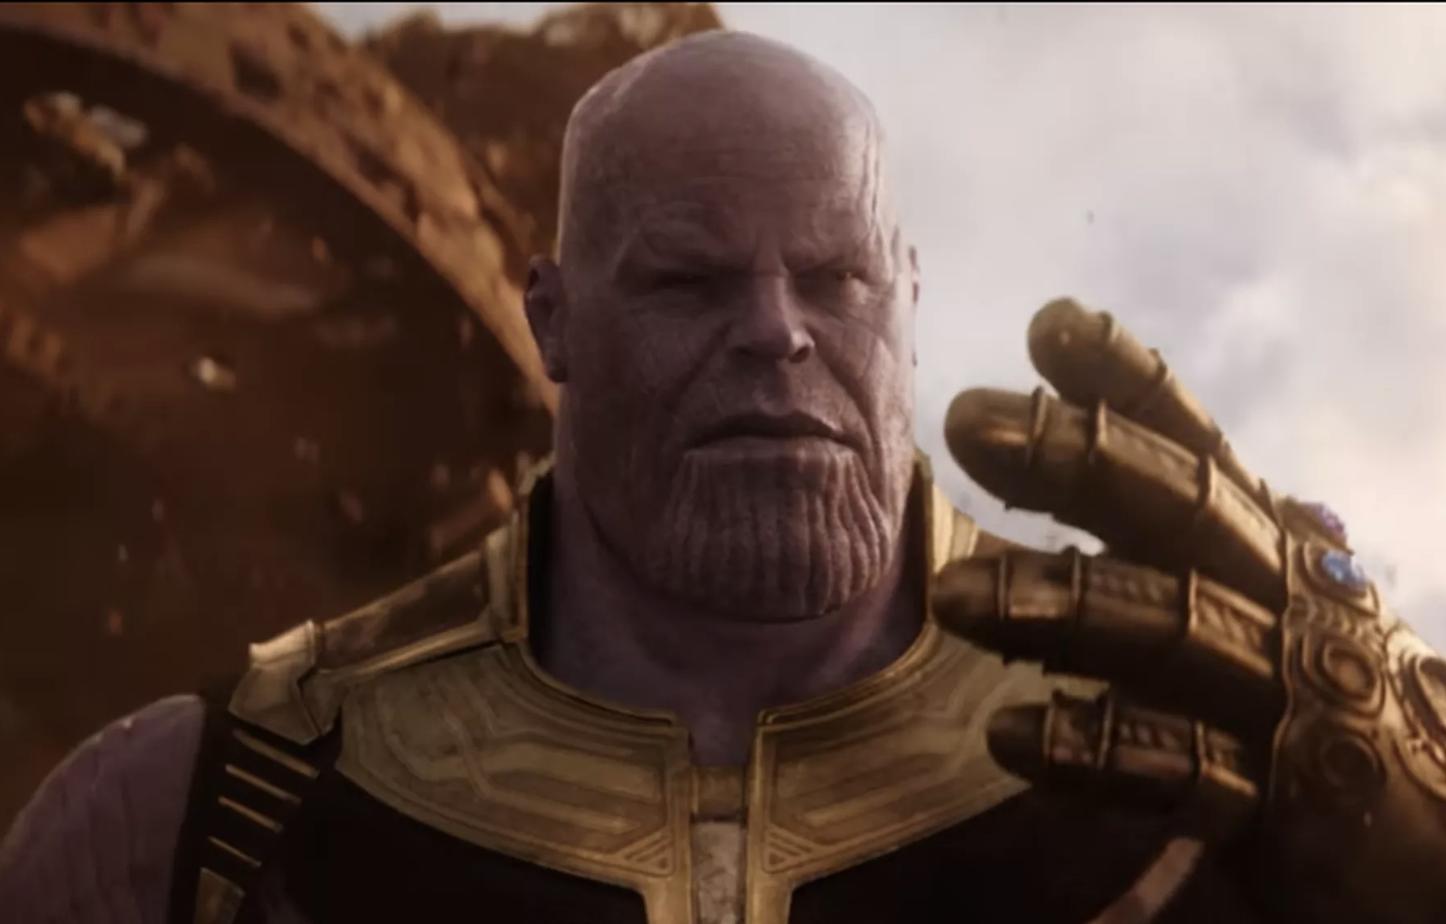 Thanos ideology